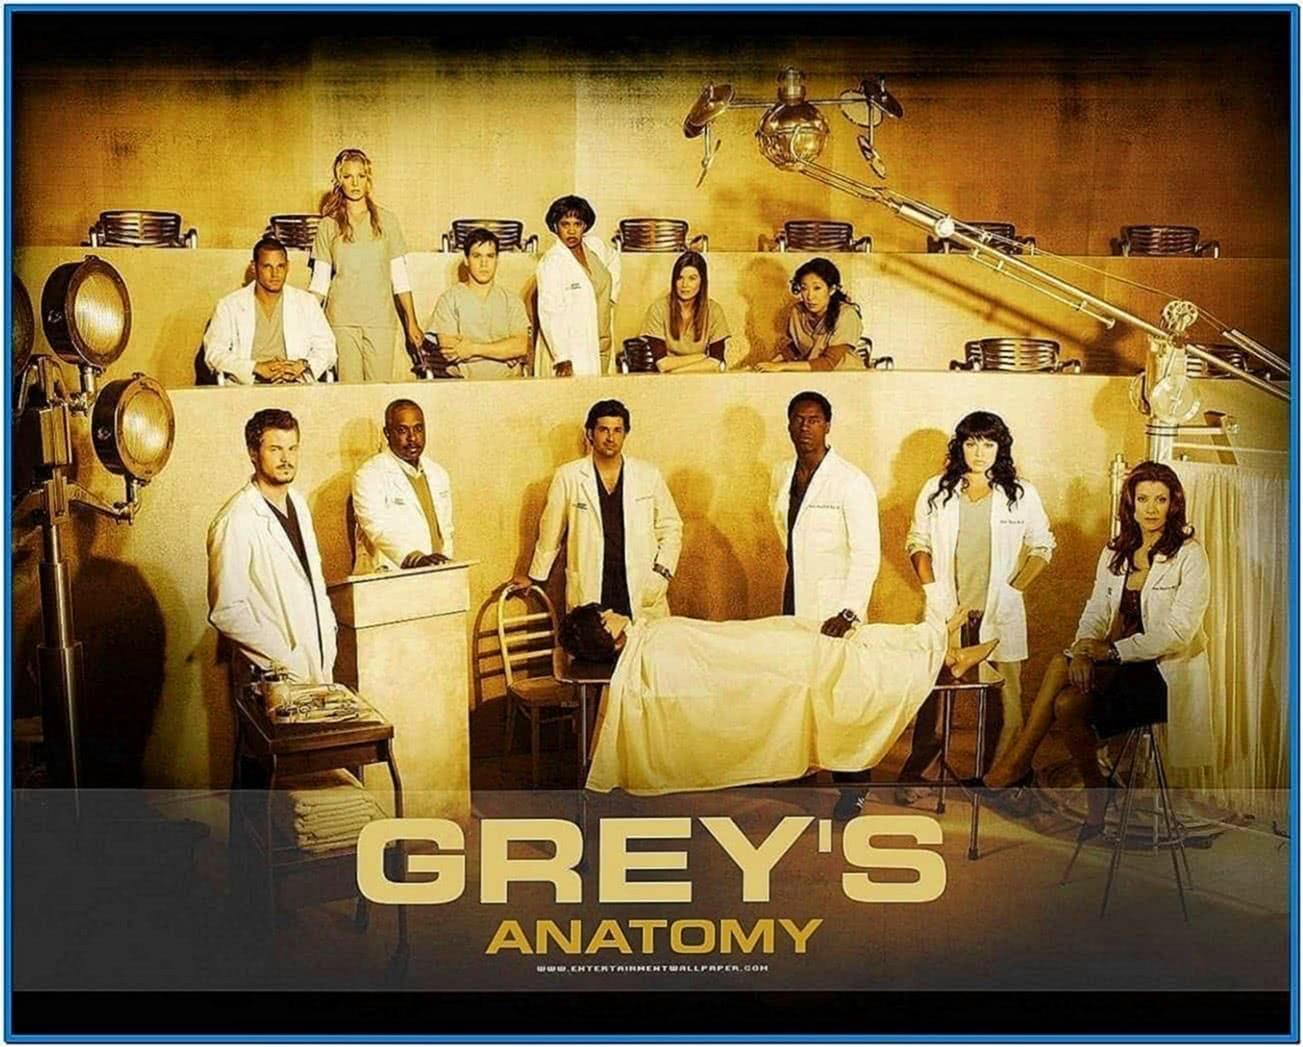 Greys Anatomy Screensaver Download Free